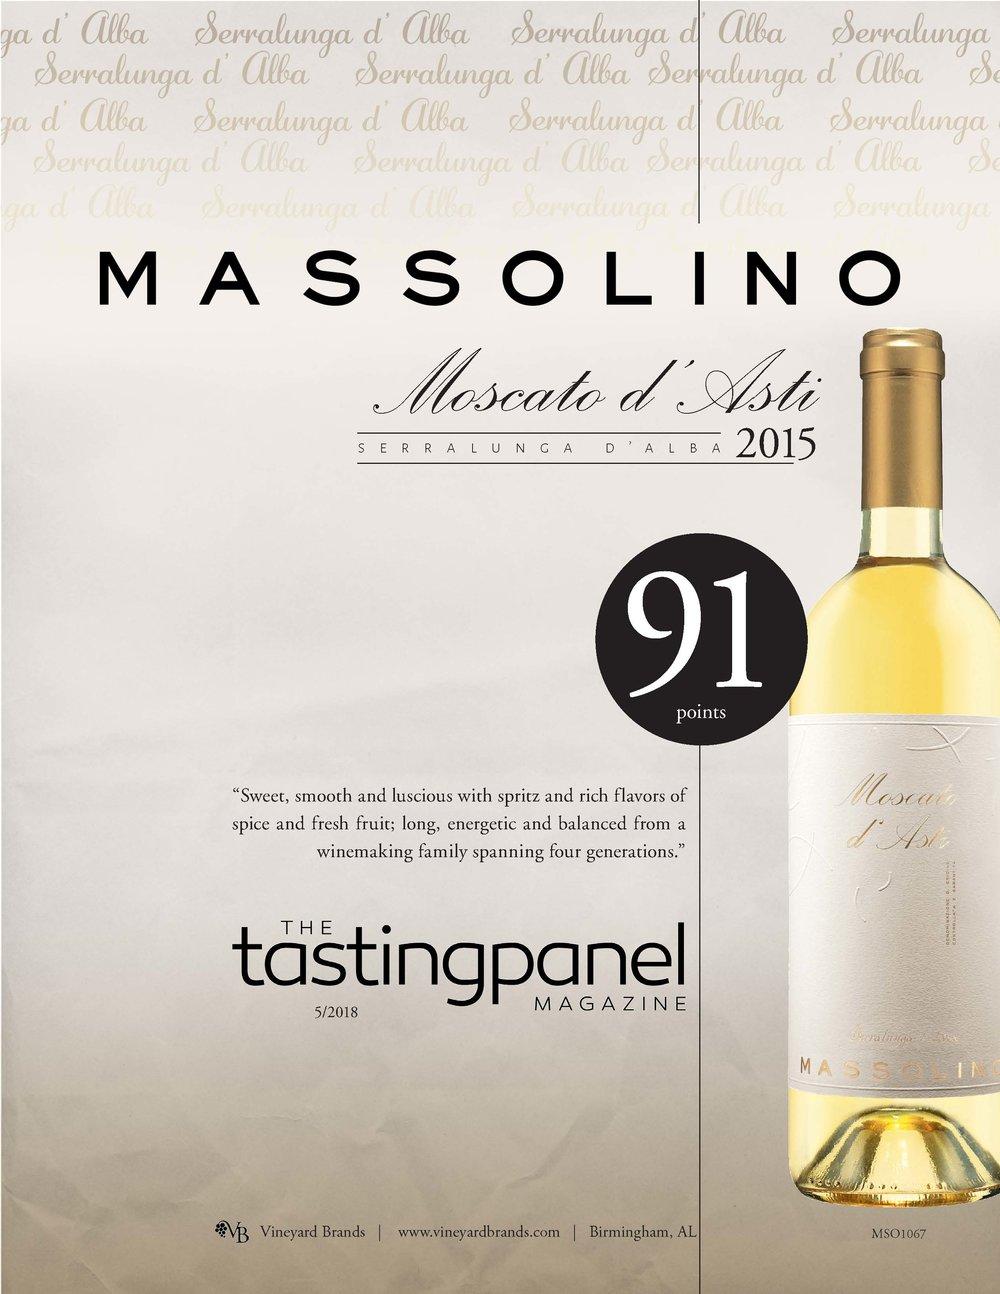 Massolino Moscato d'Asti 2015.jpg